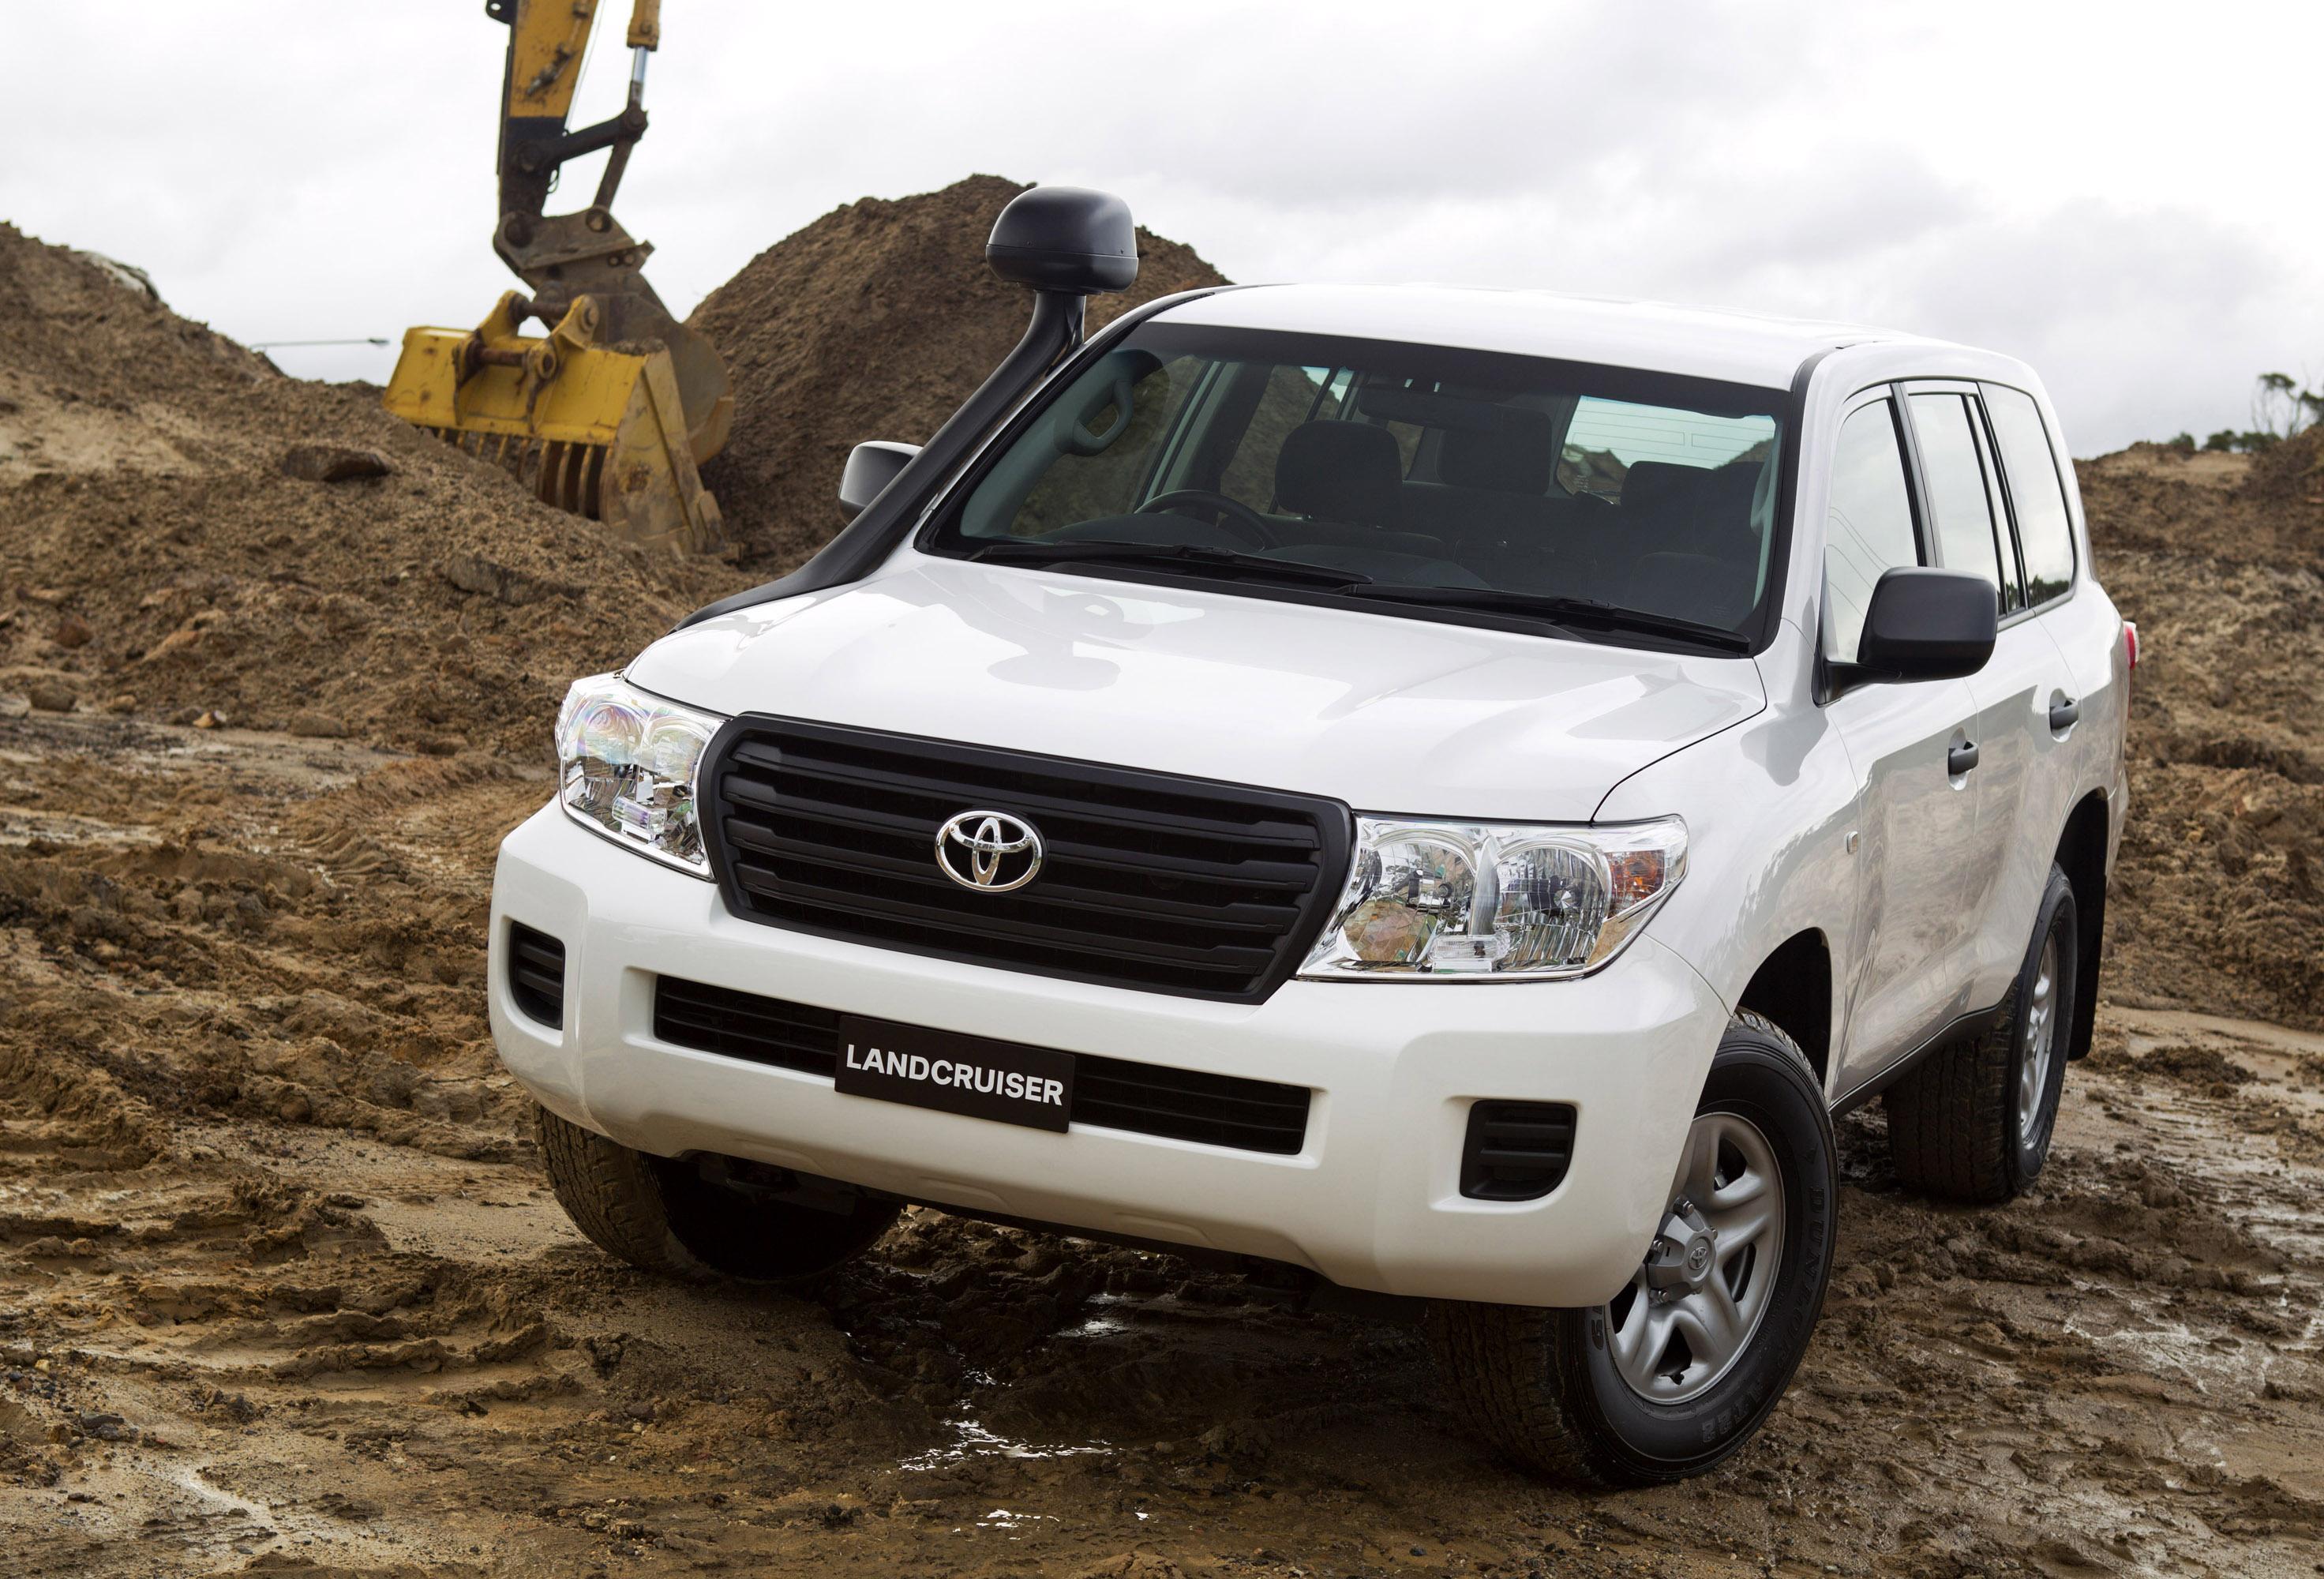 Land Cruiser Car Interior >> 2012 Toyota LandCruiser 200 with new 4.6 liter V8 engine